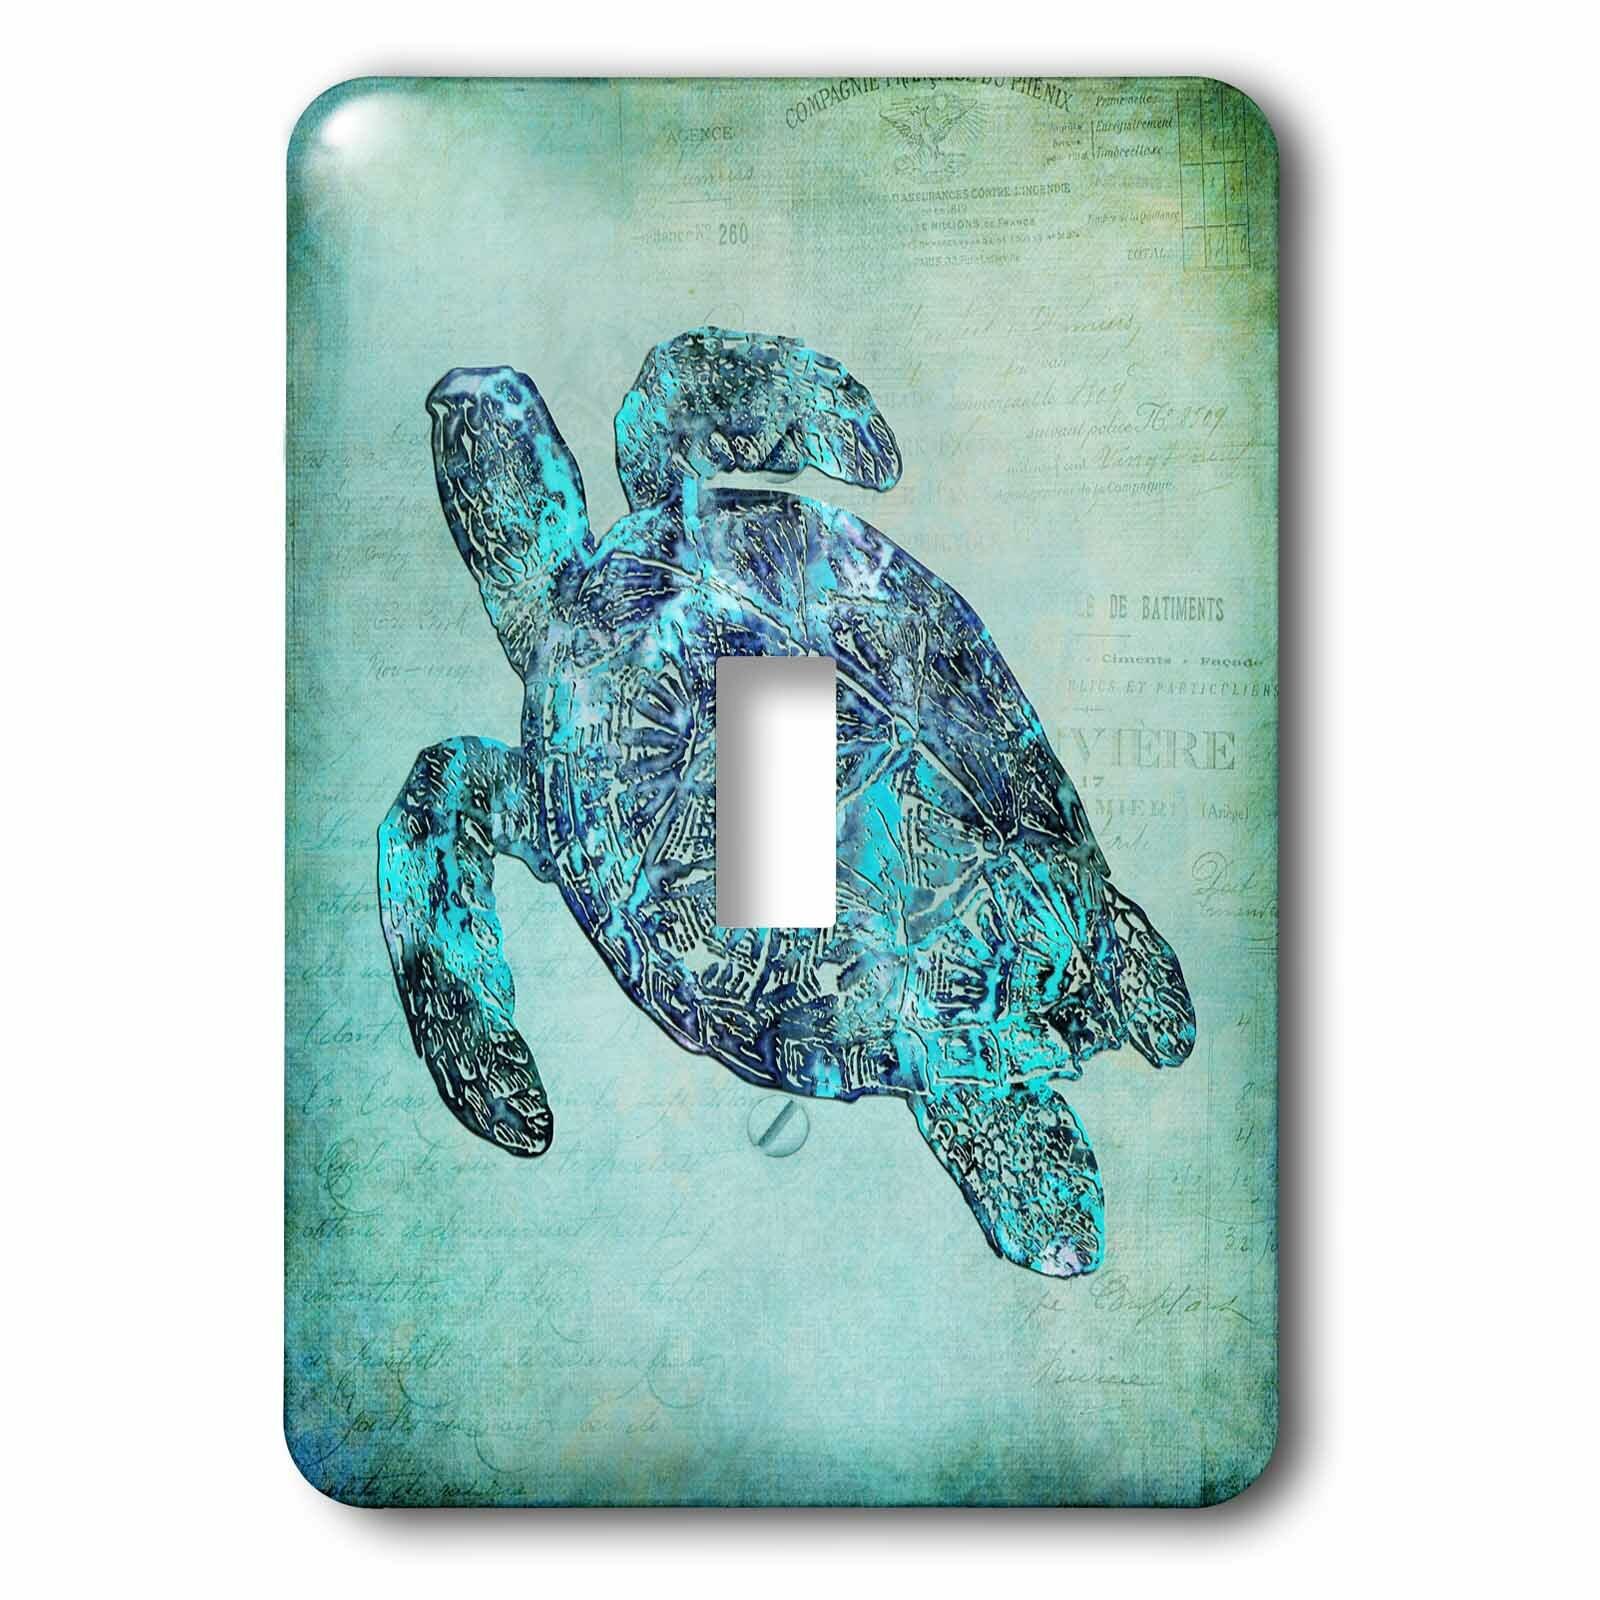 3drose Sea Turtle 1 Gang Toggle Light Switch Wall Plate Wayfair